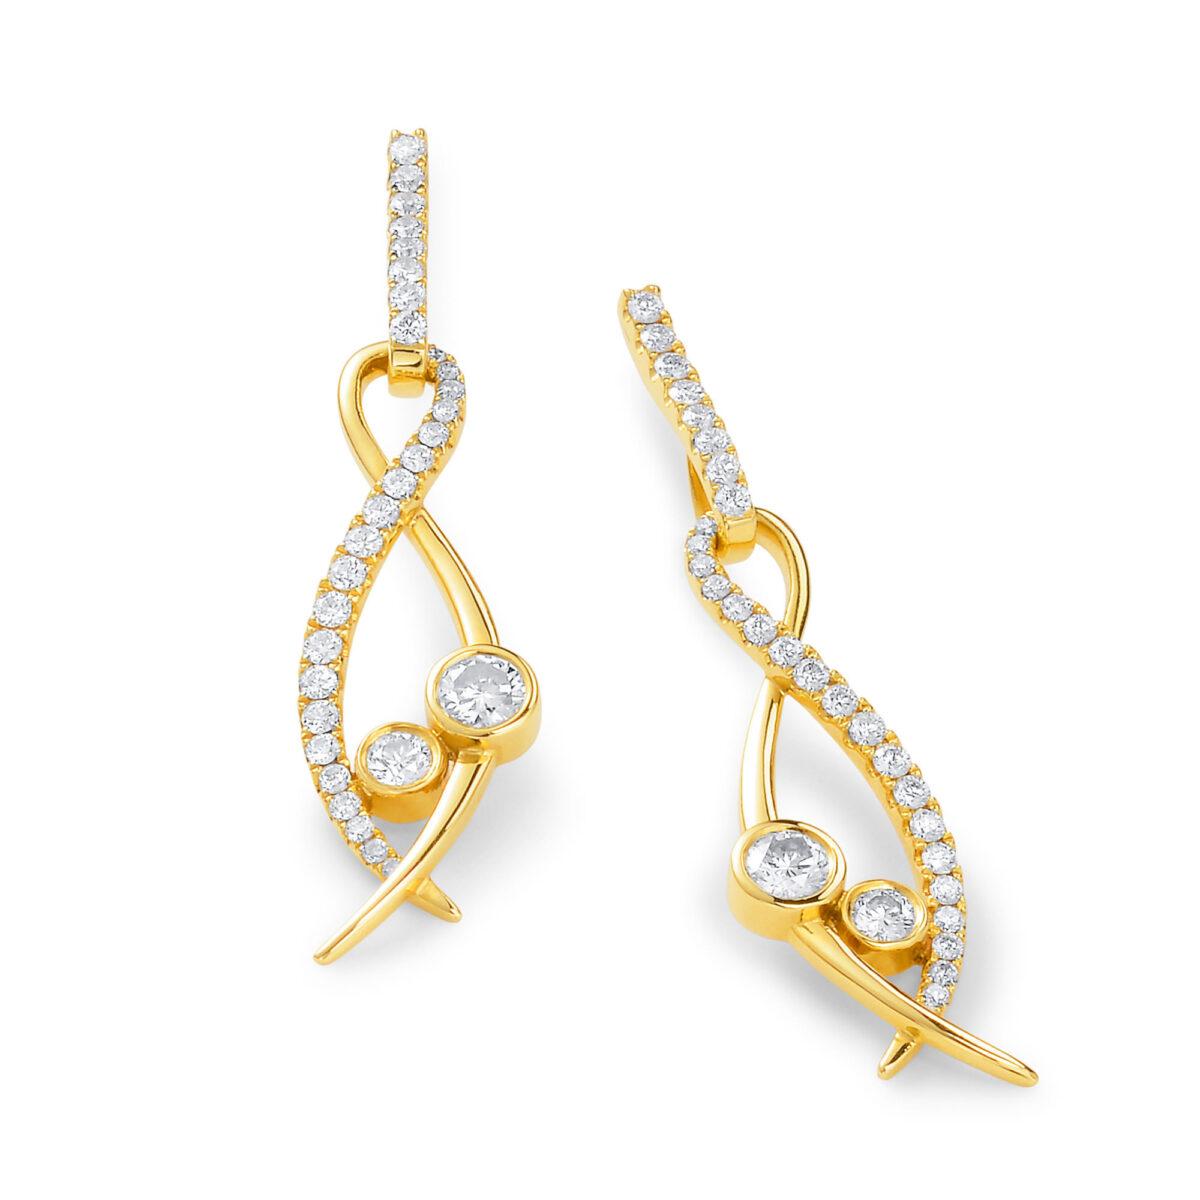 product/l/u/lunar_earrings_yellow_gold_2.jpg;;product/d/m/dmr-packaging_103.jpg